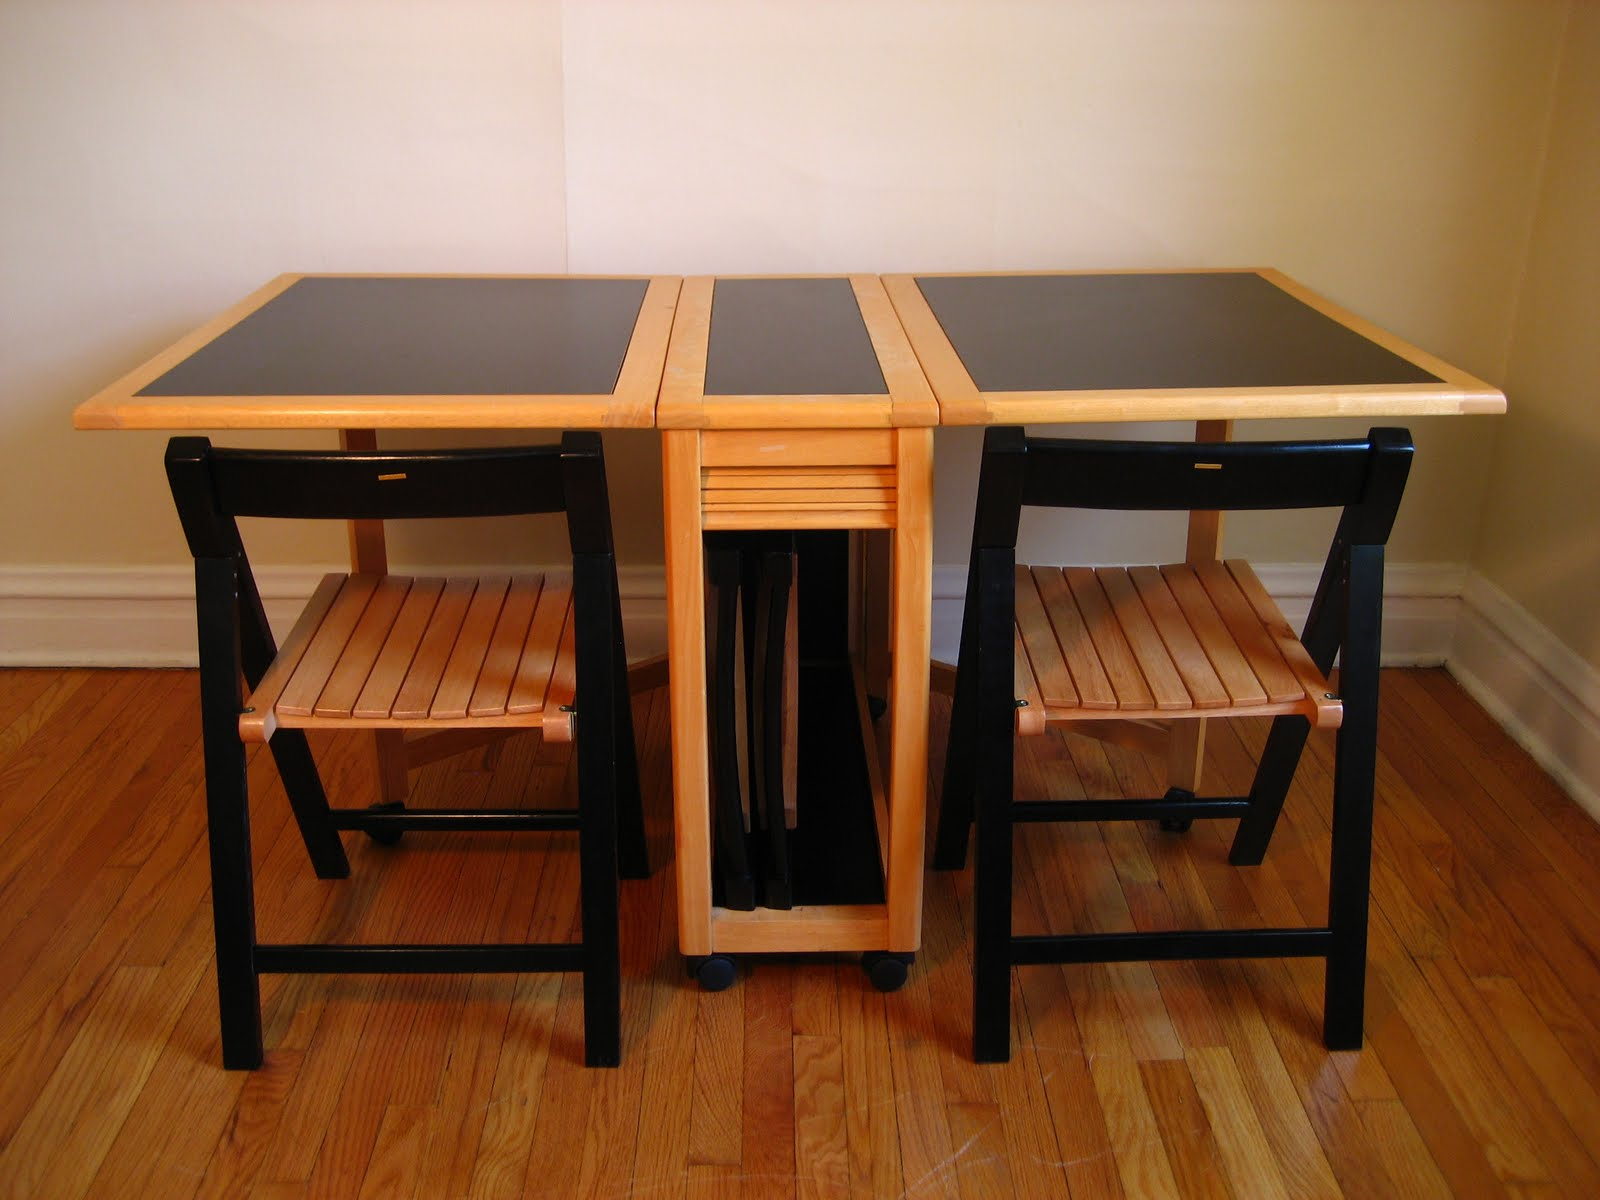 flatout design march 2010. Black Bedroom Furniture Sets. Home Design Ideas